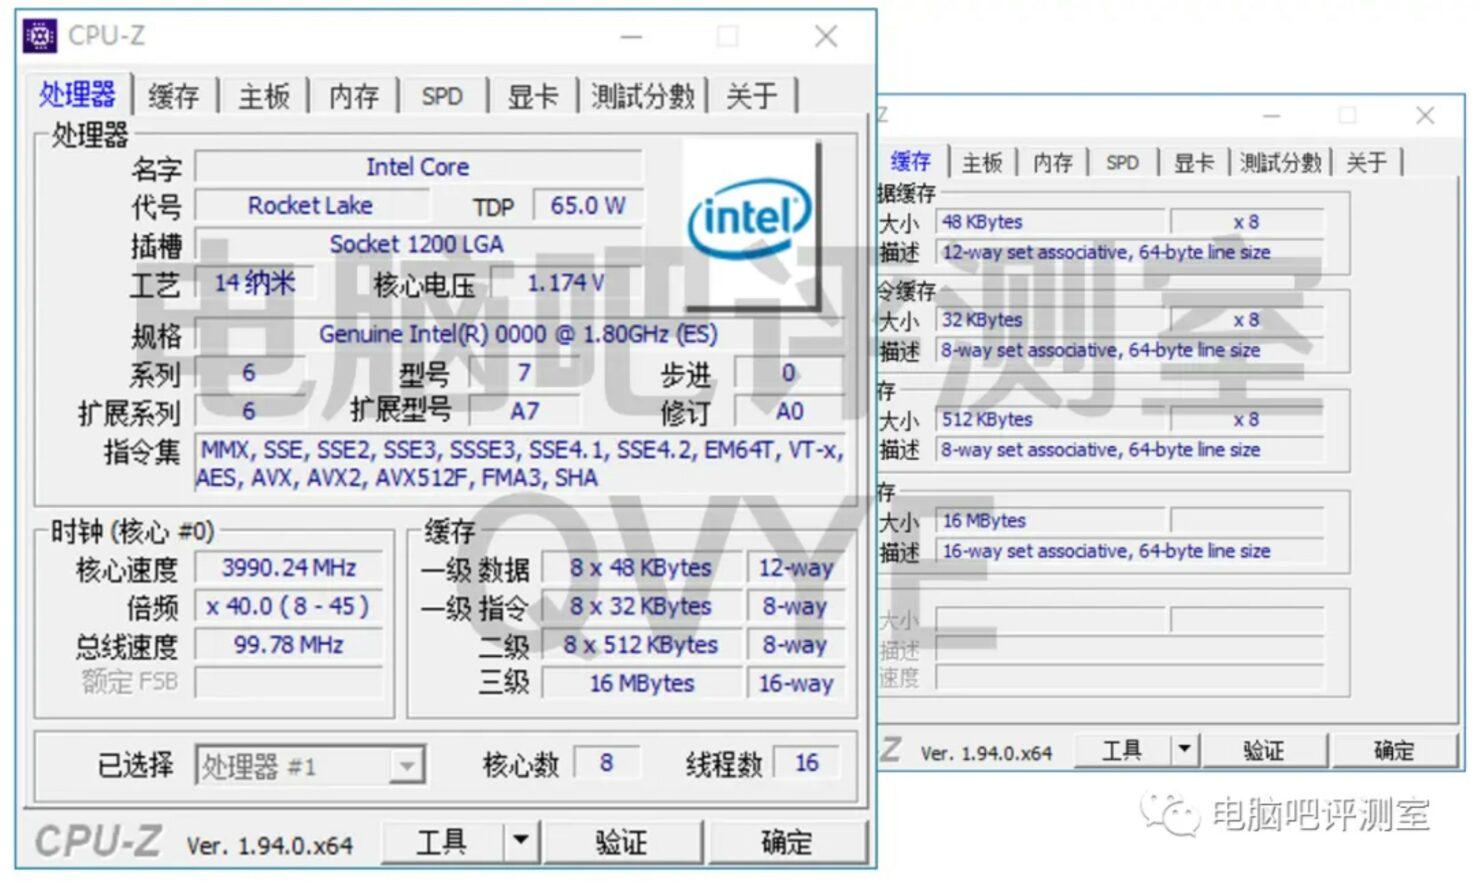 intel-core-i9-11900-rocket-lake-8-core-desktop-cpu-_2-custom